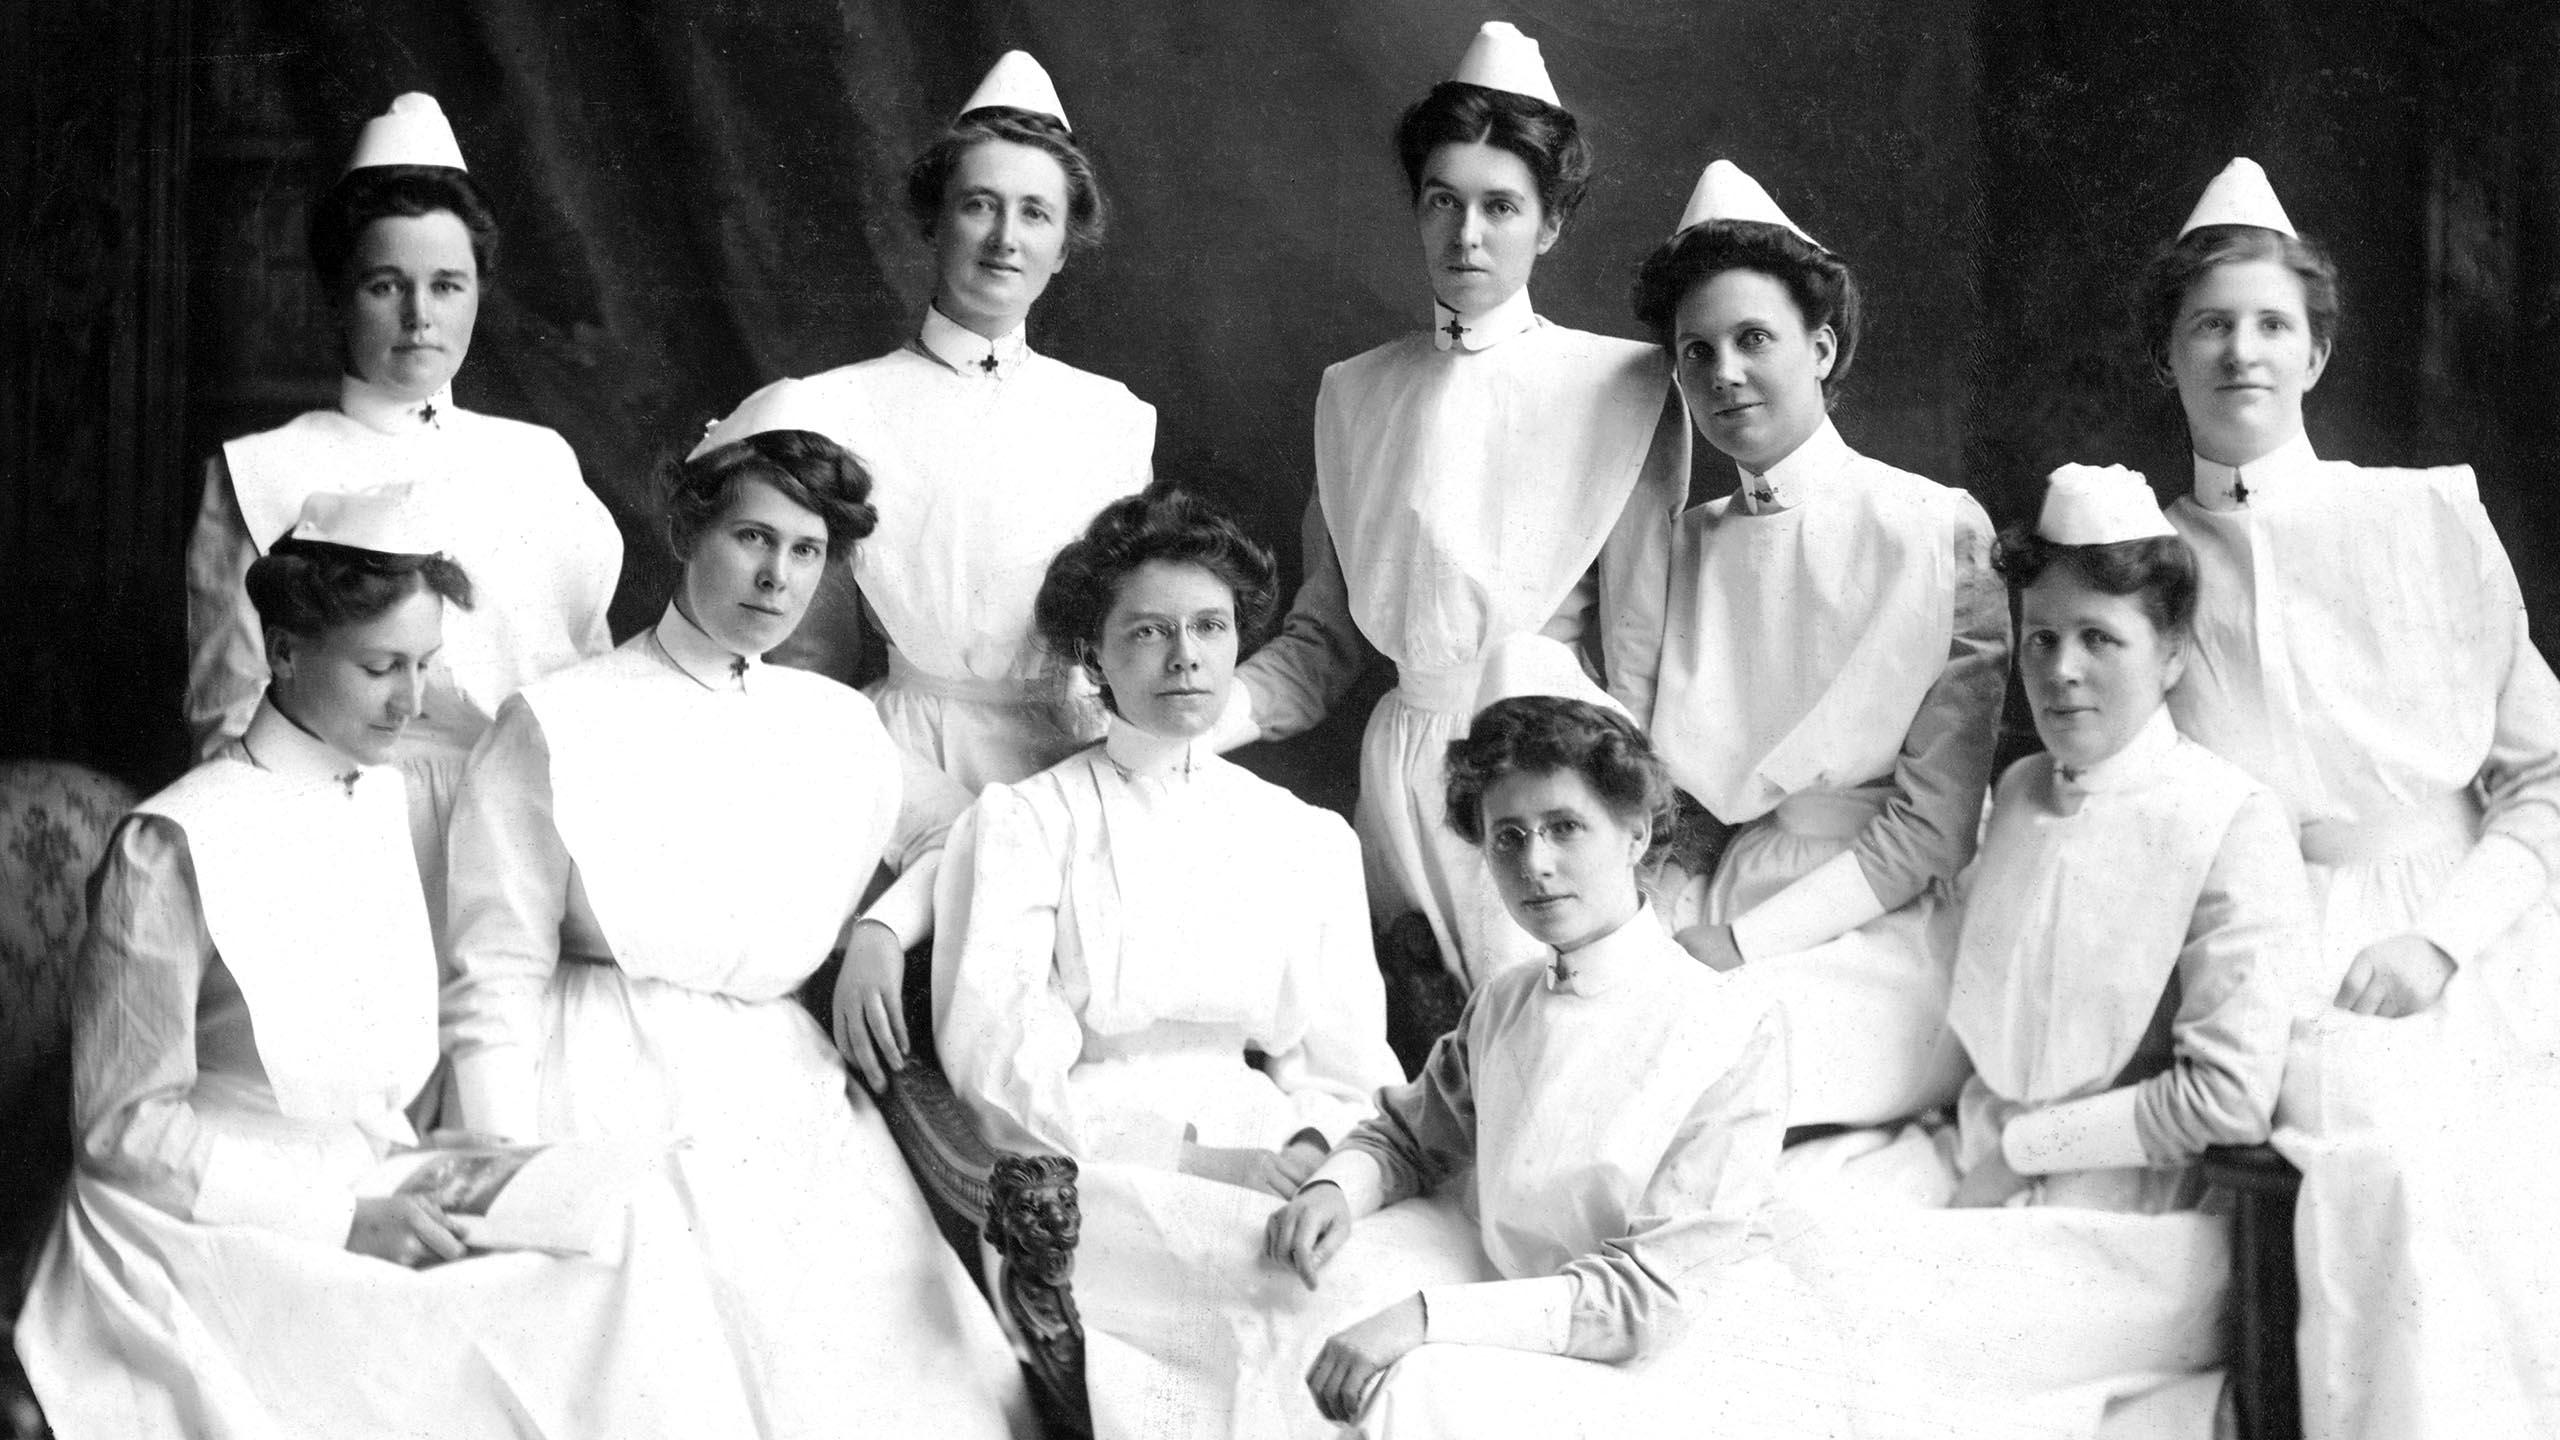 Graduating nurses 1908